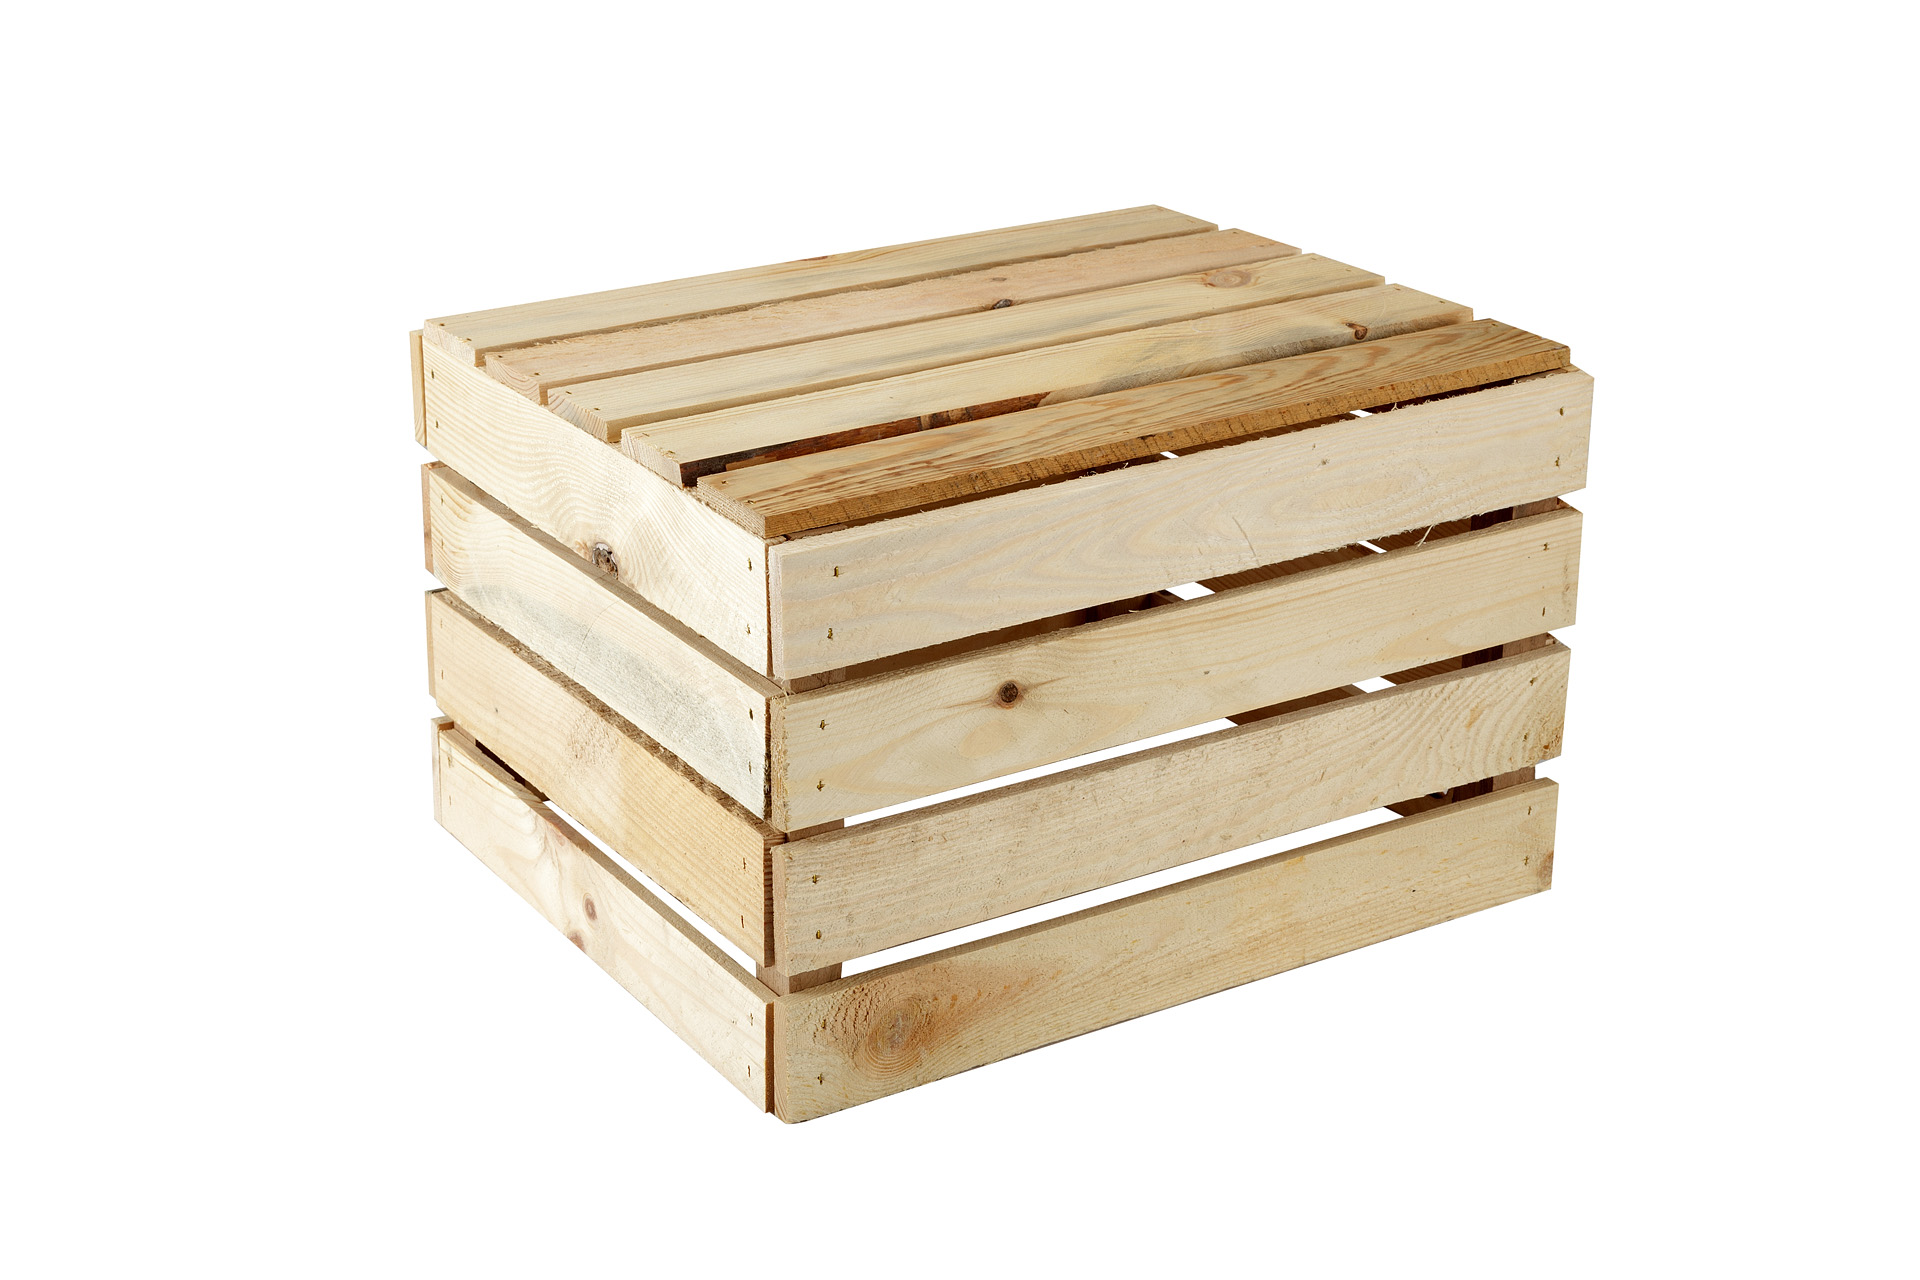 GrandBox Caja de Madera Natural-Box Caja de Vino Caja de Frutas Caja Decorativa Almacenamiento Vintage Shabby Chic Retro Caja de le/éa